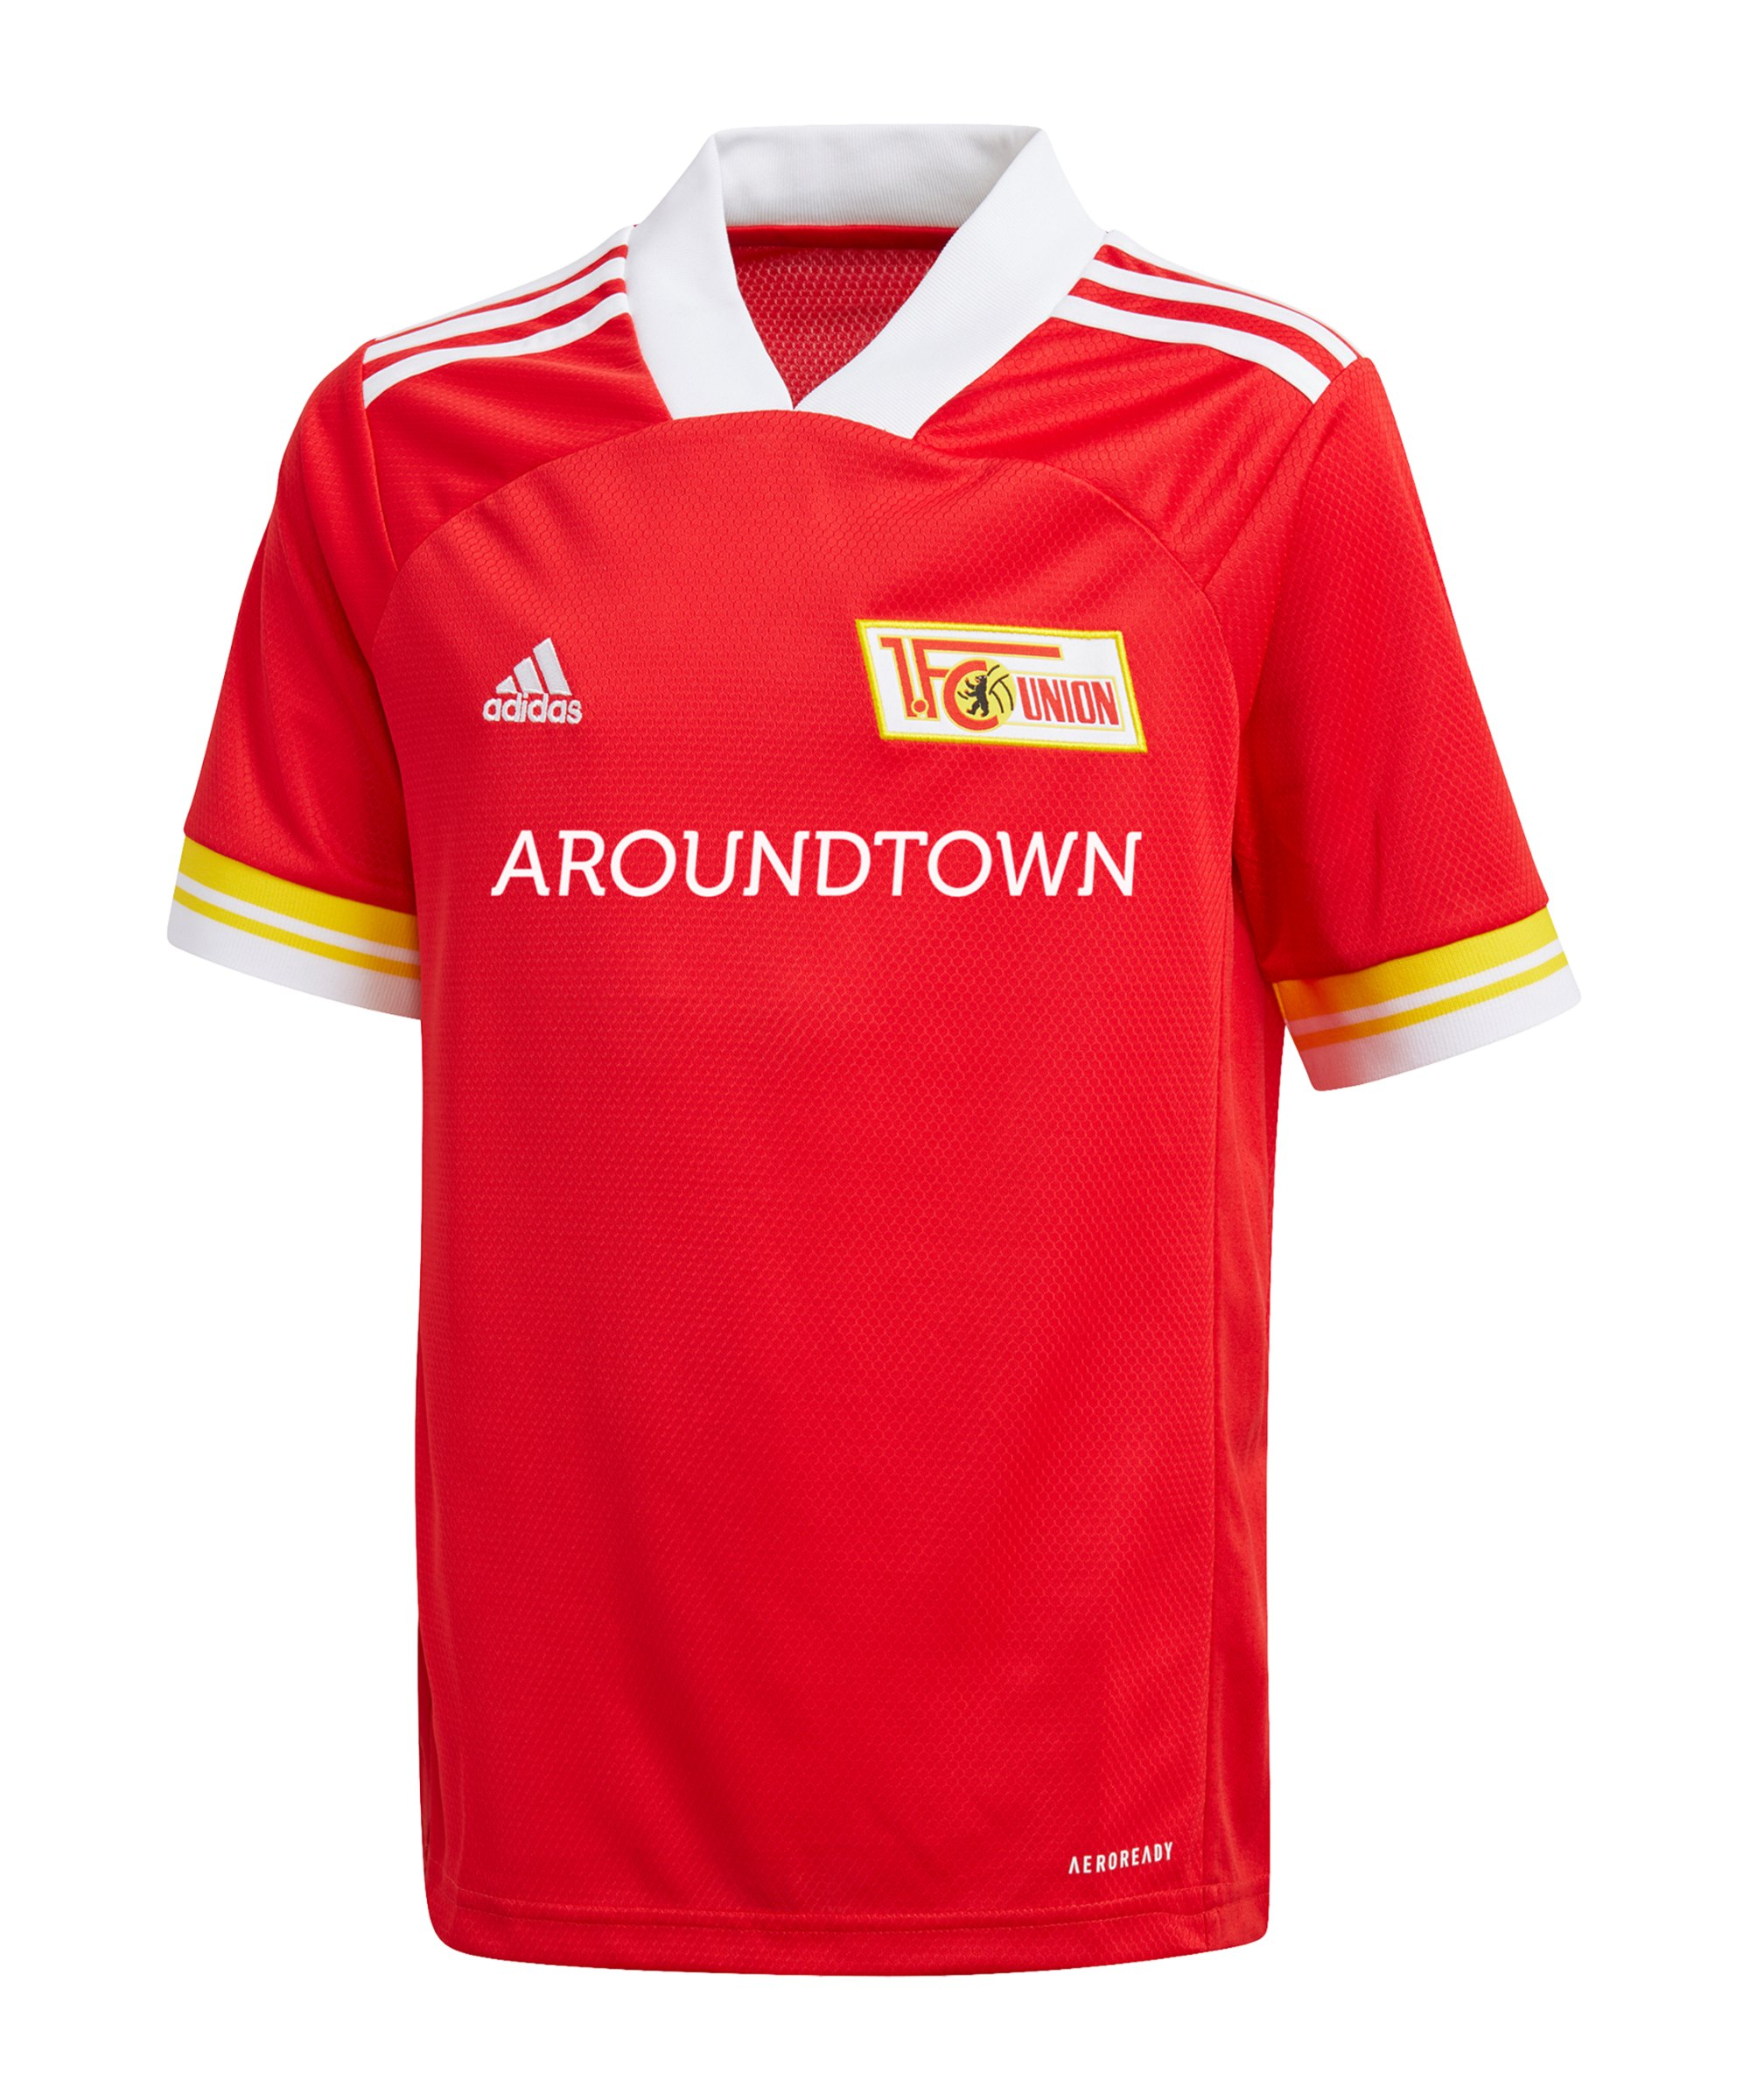 adidas 1. FC Union Berlin Trikot Home 2020/2021 Kids Rot - rot